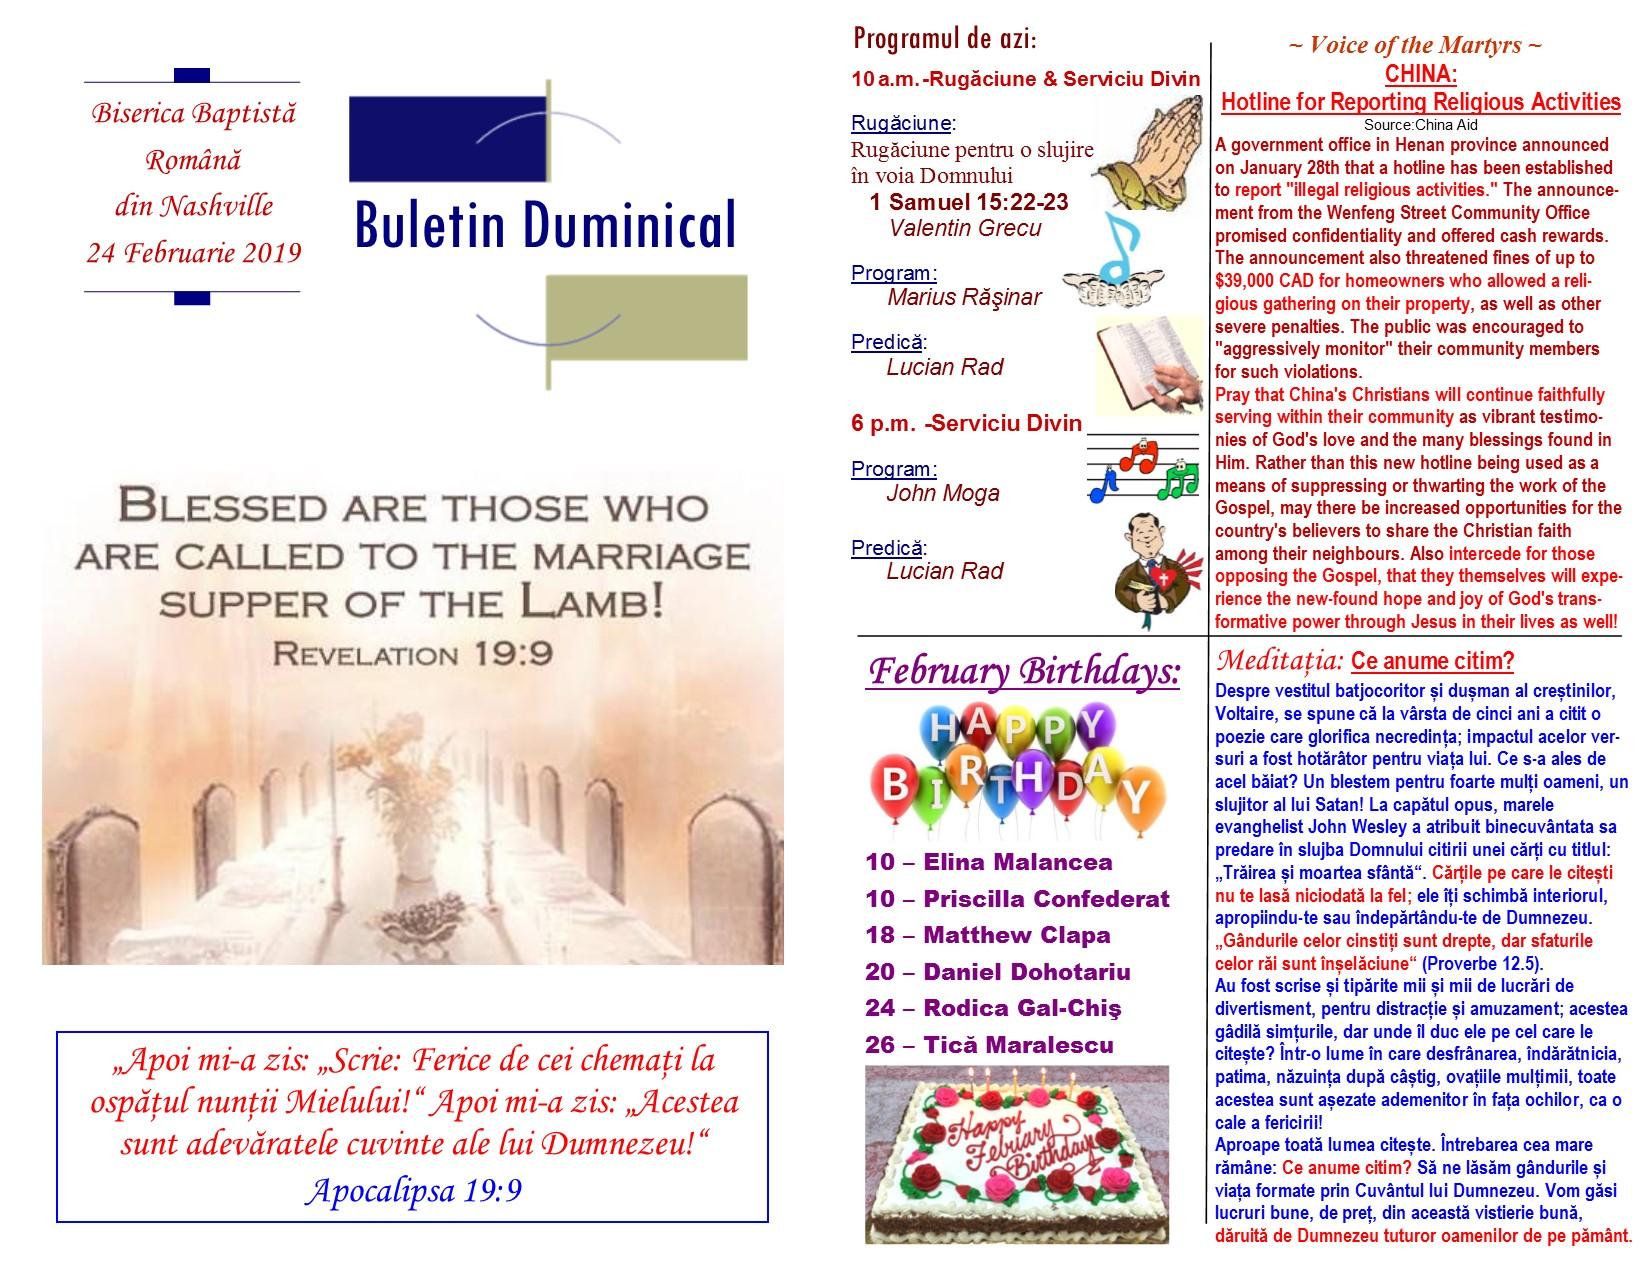 Buletin 02-24-19 page 1 & 2